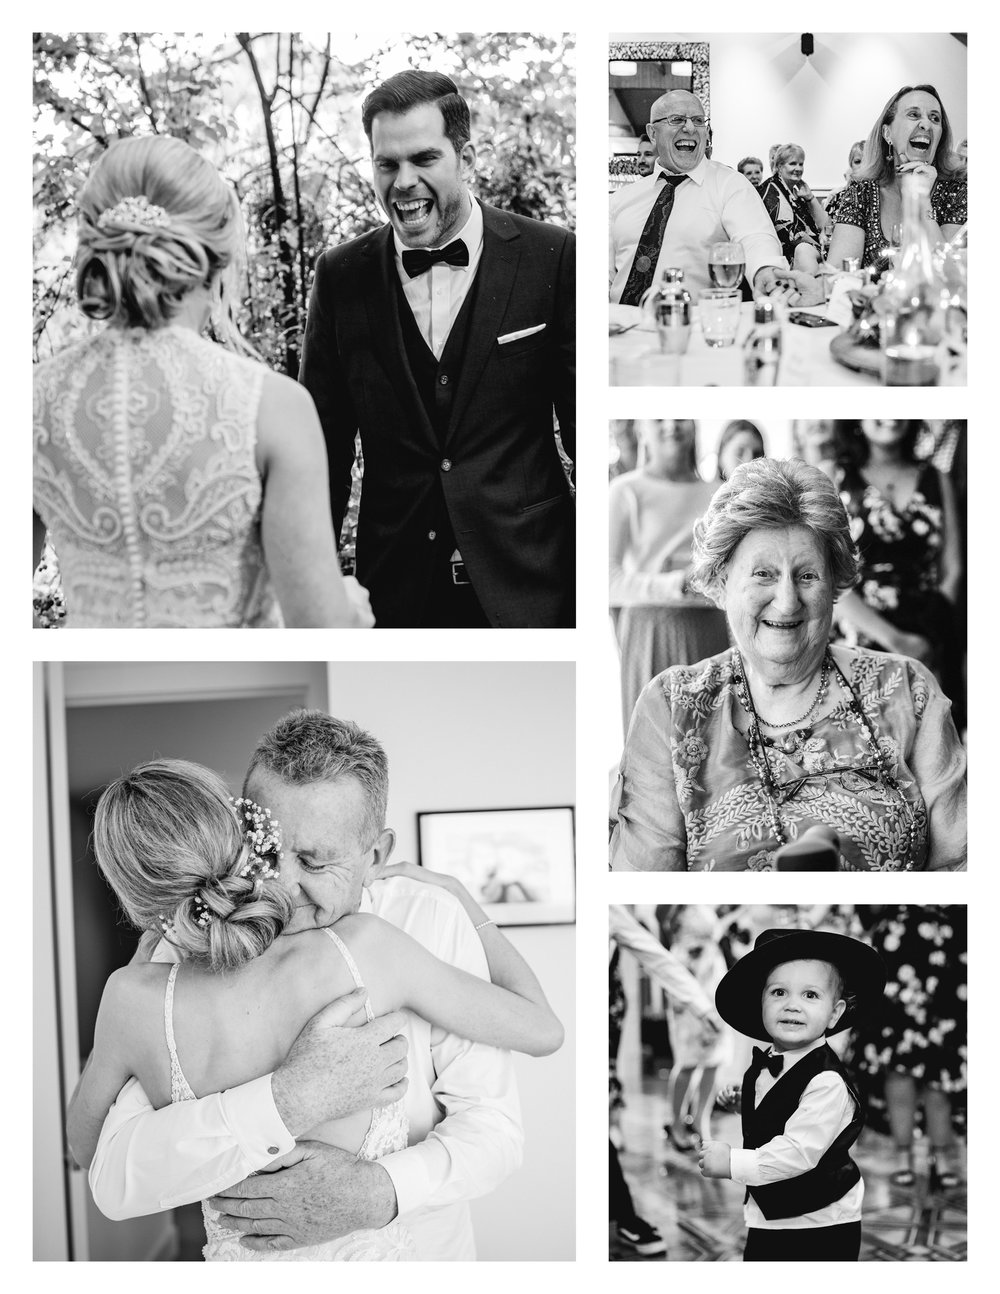 wedding-moments-collage.jpg